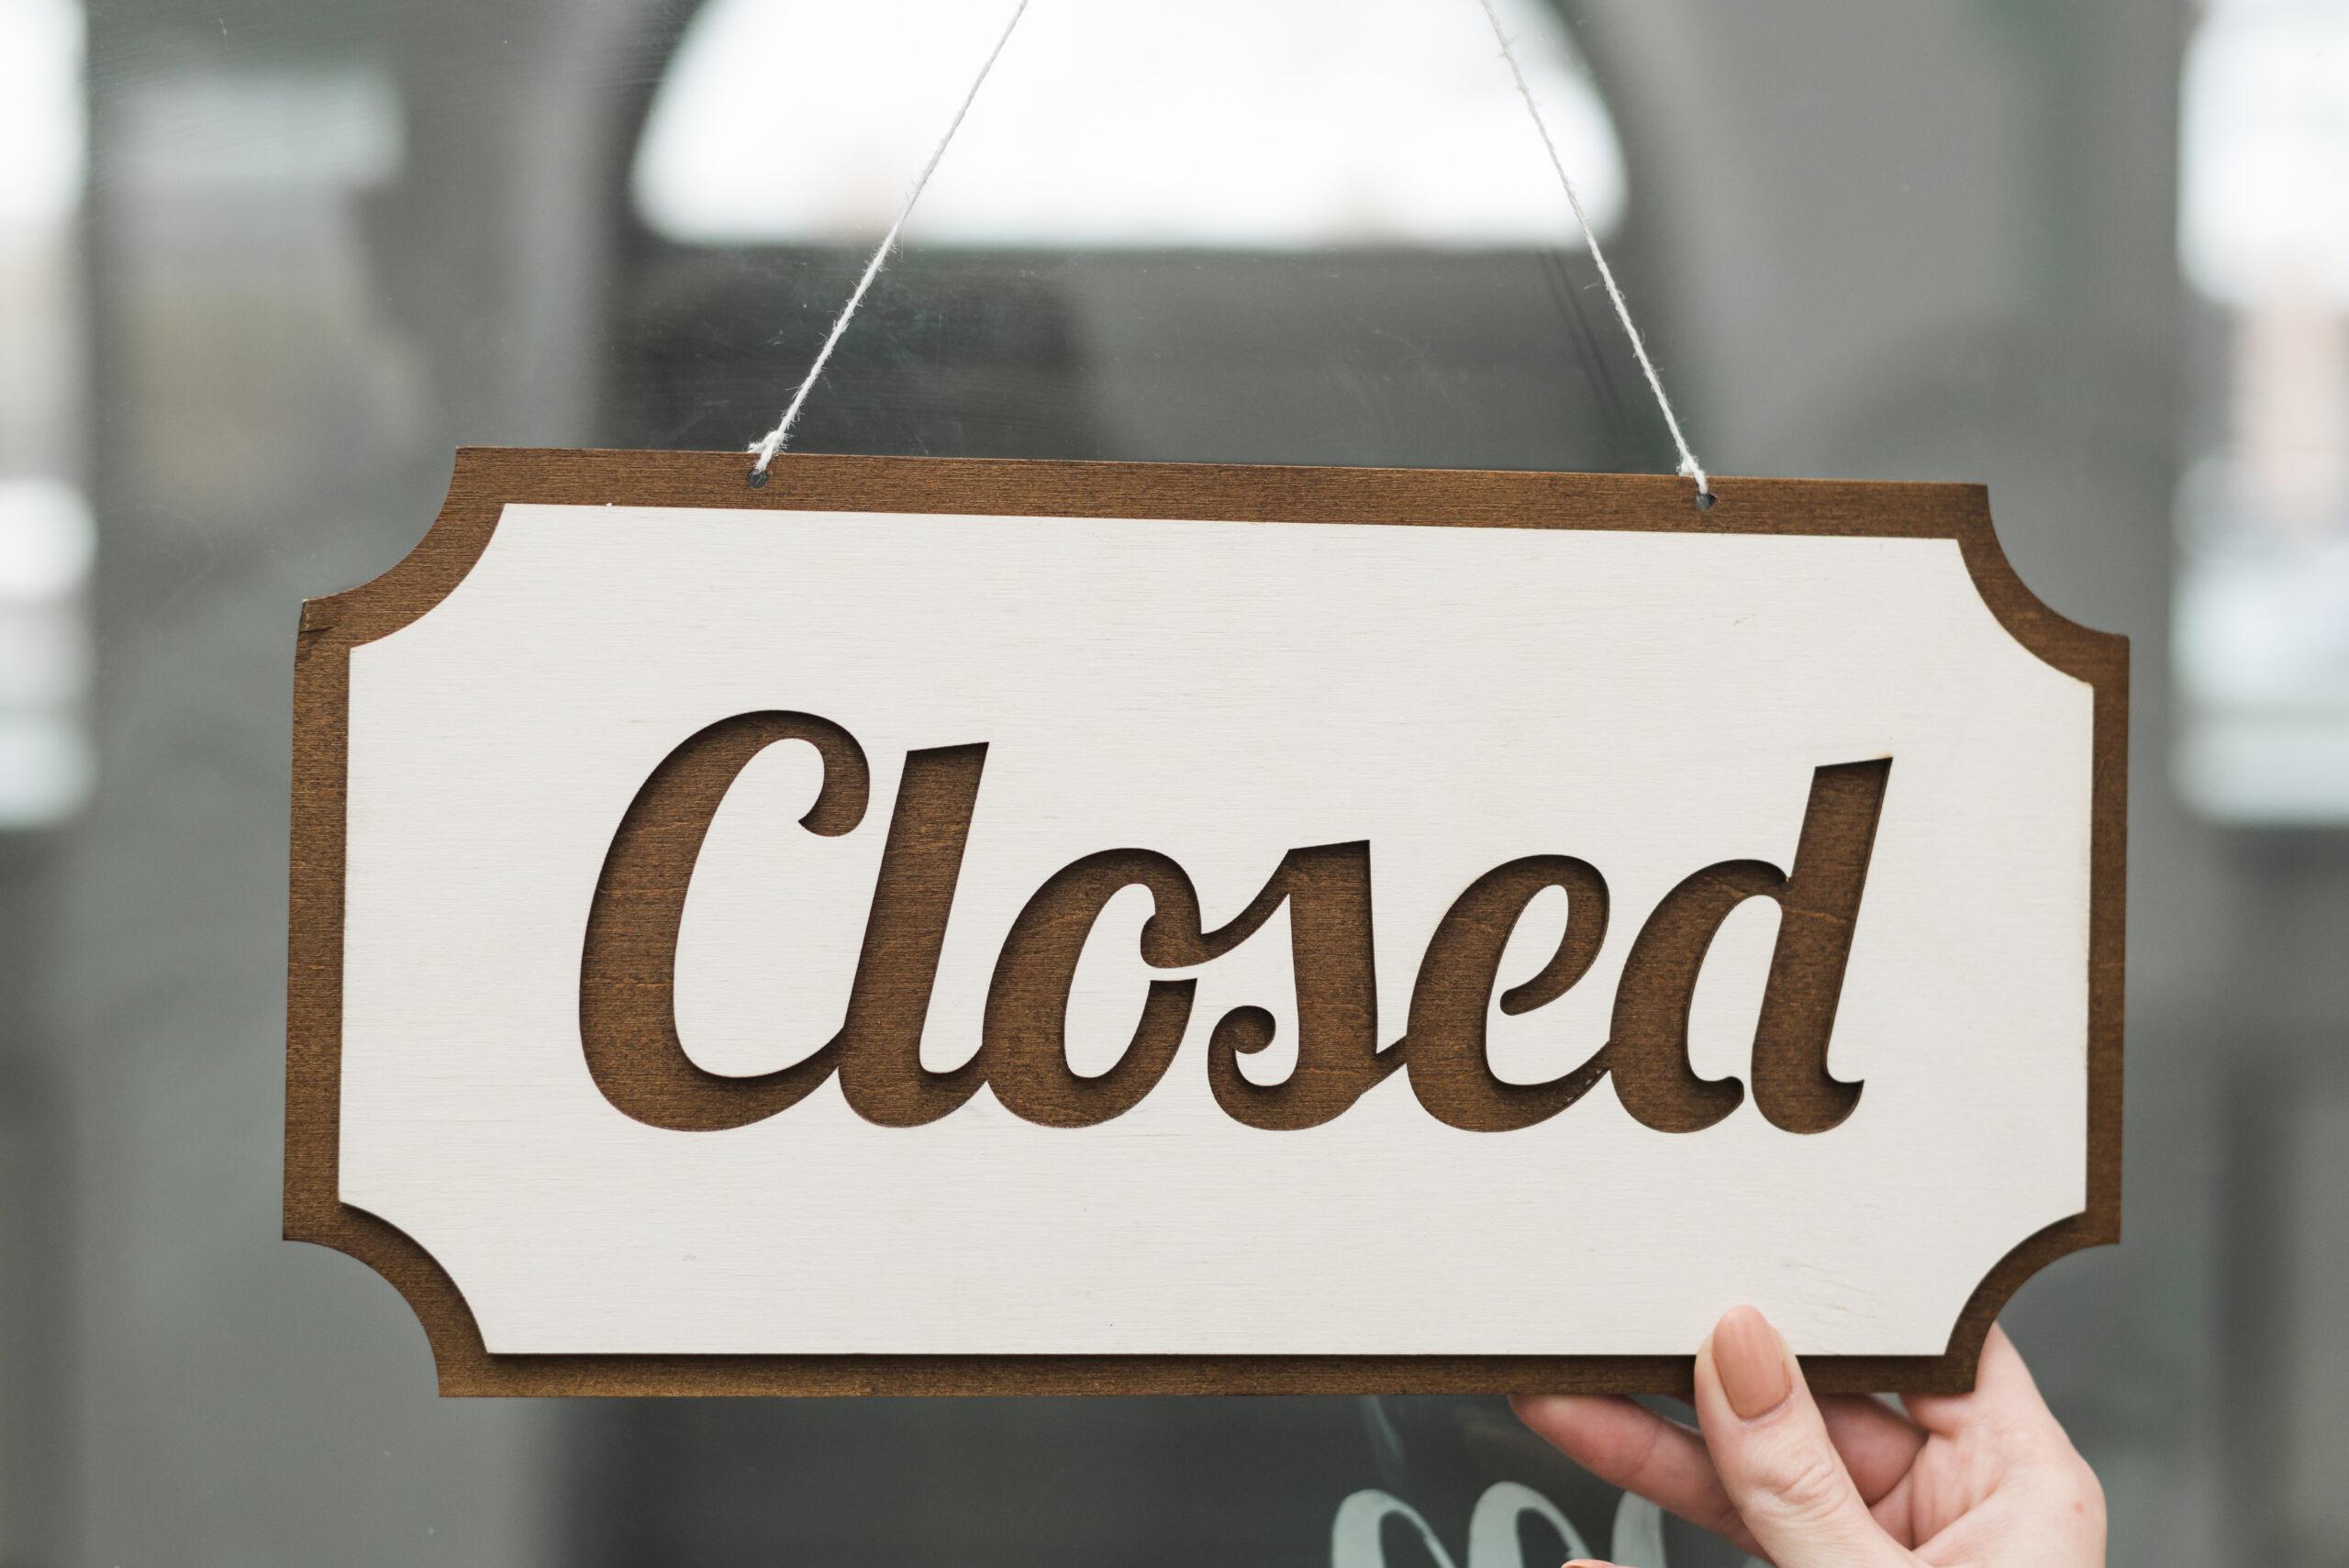 Business income miami florida closed sign